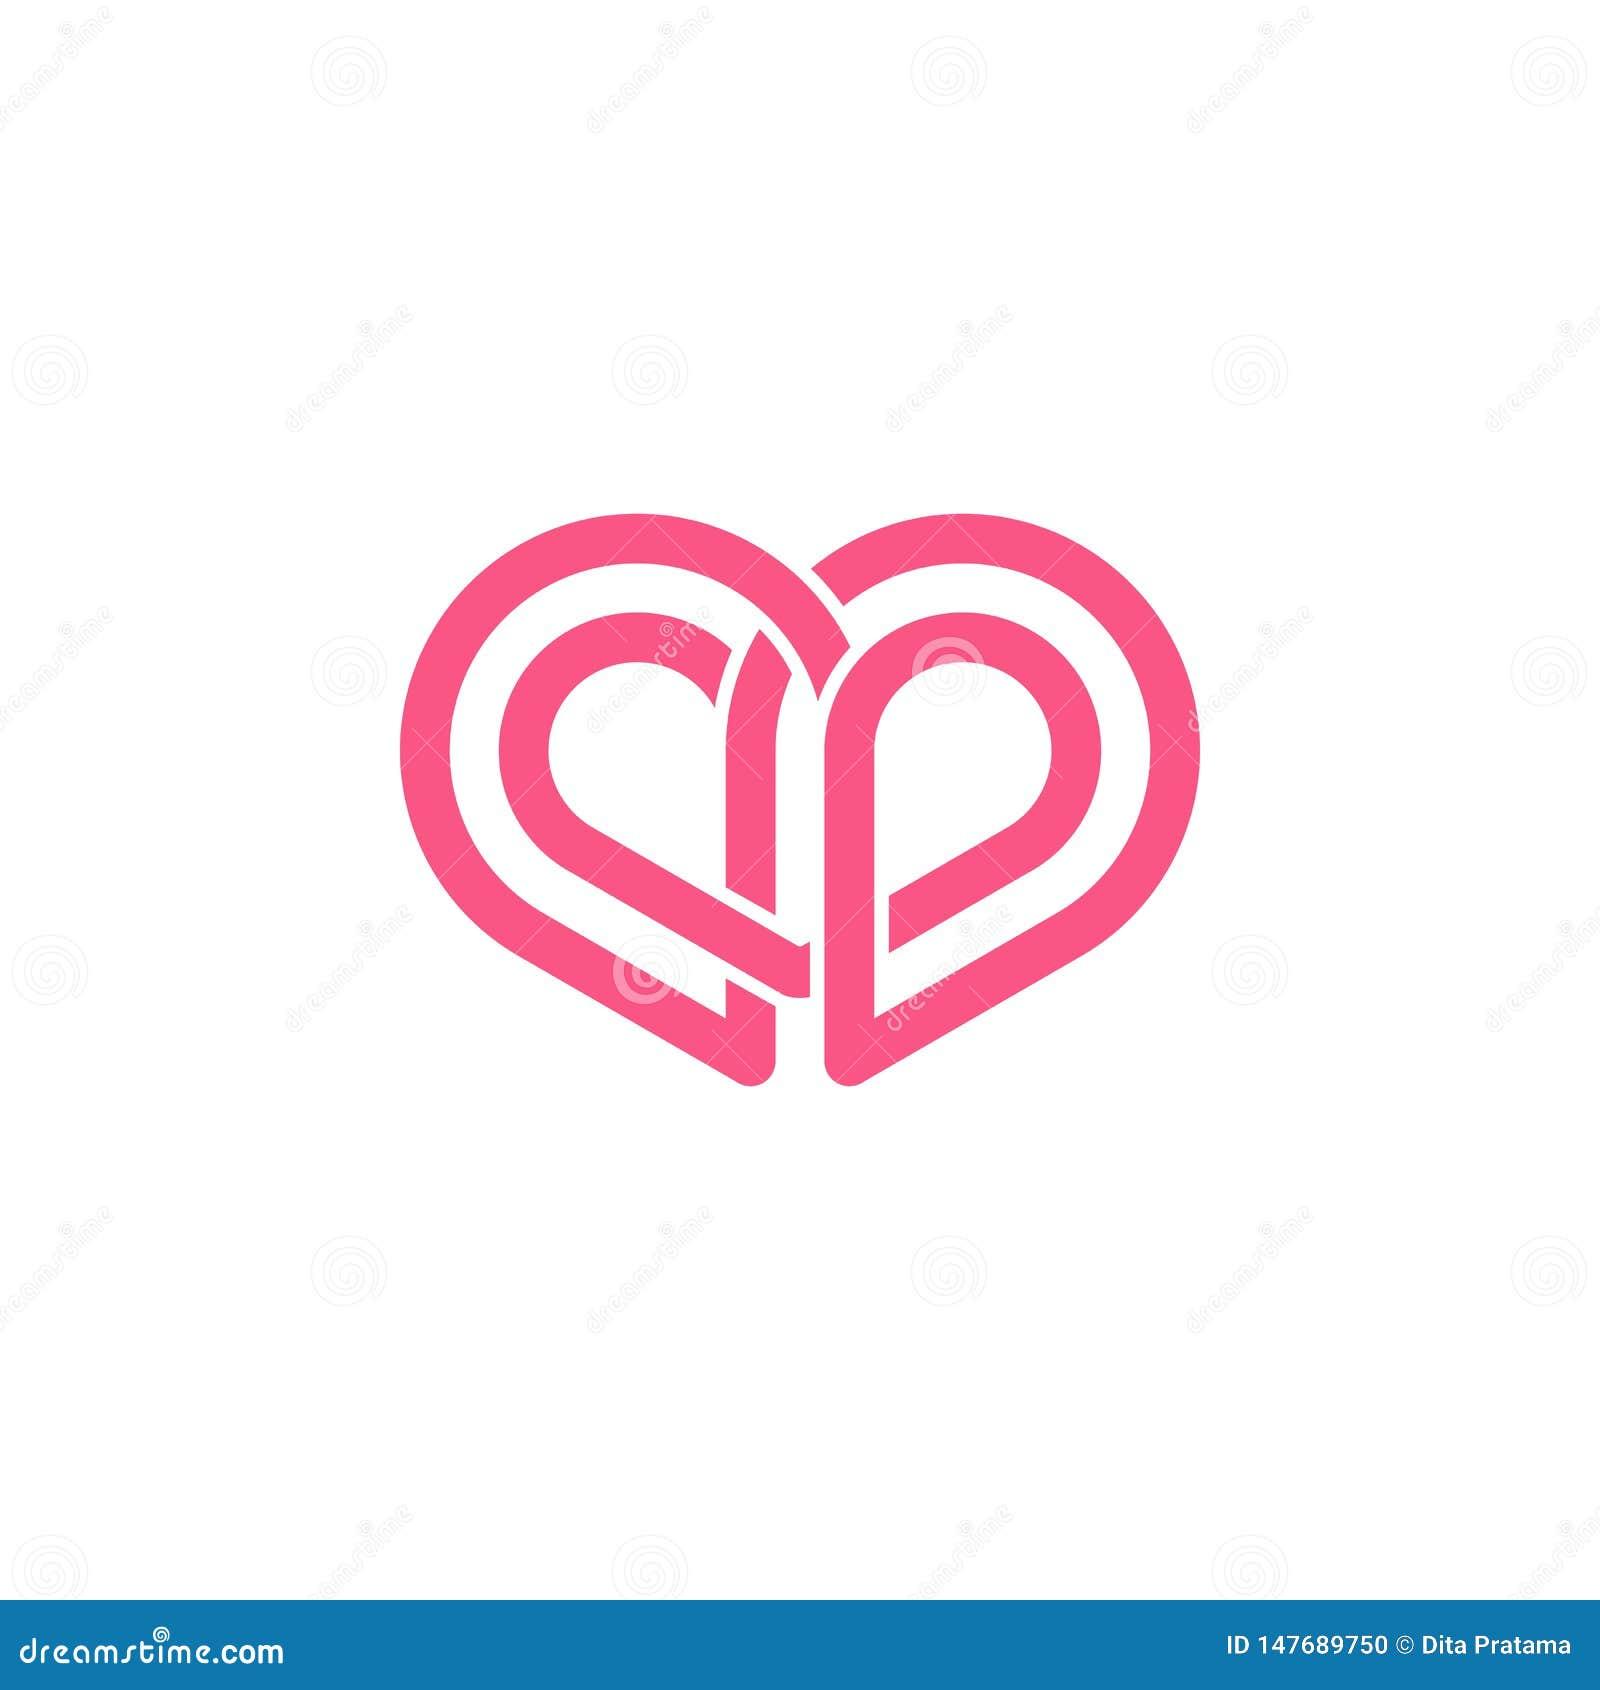 Abstract love shape logo.